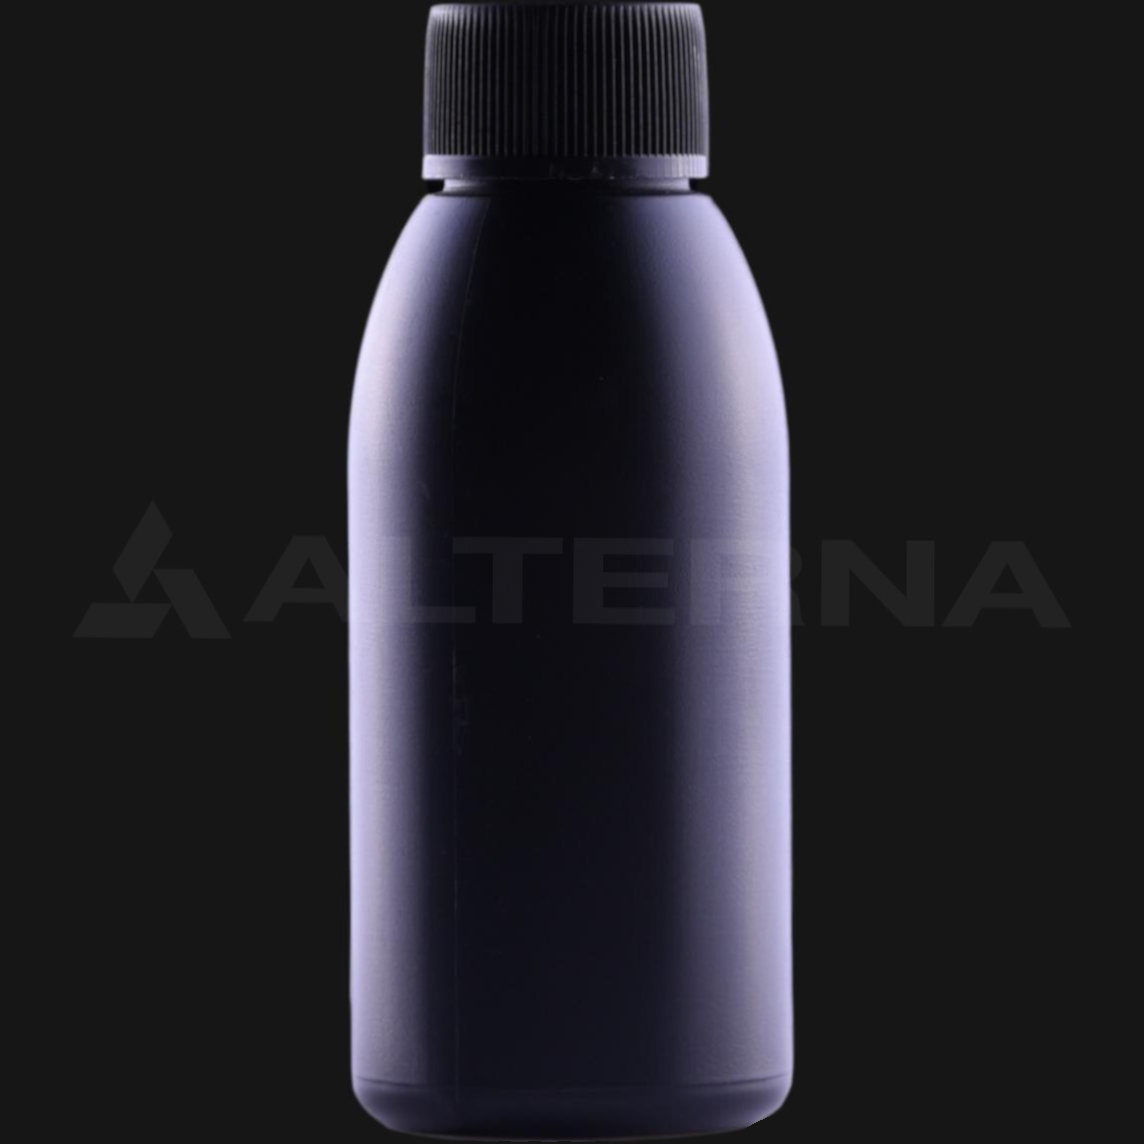 100 ml HDPE Bottle with 24 mm Foam Seal Cap